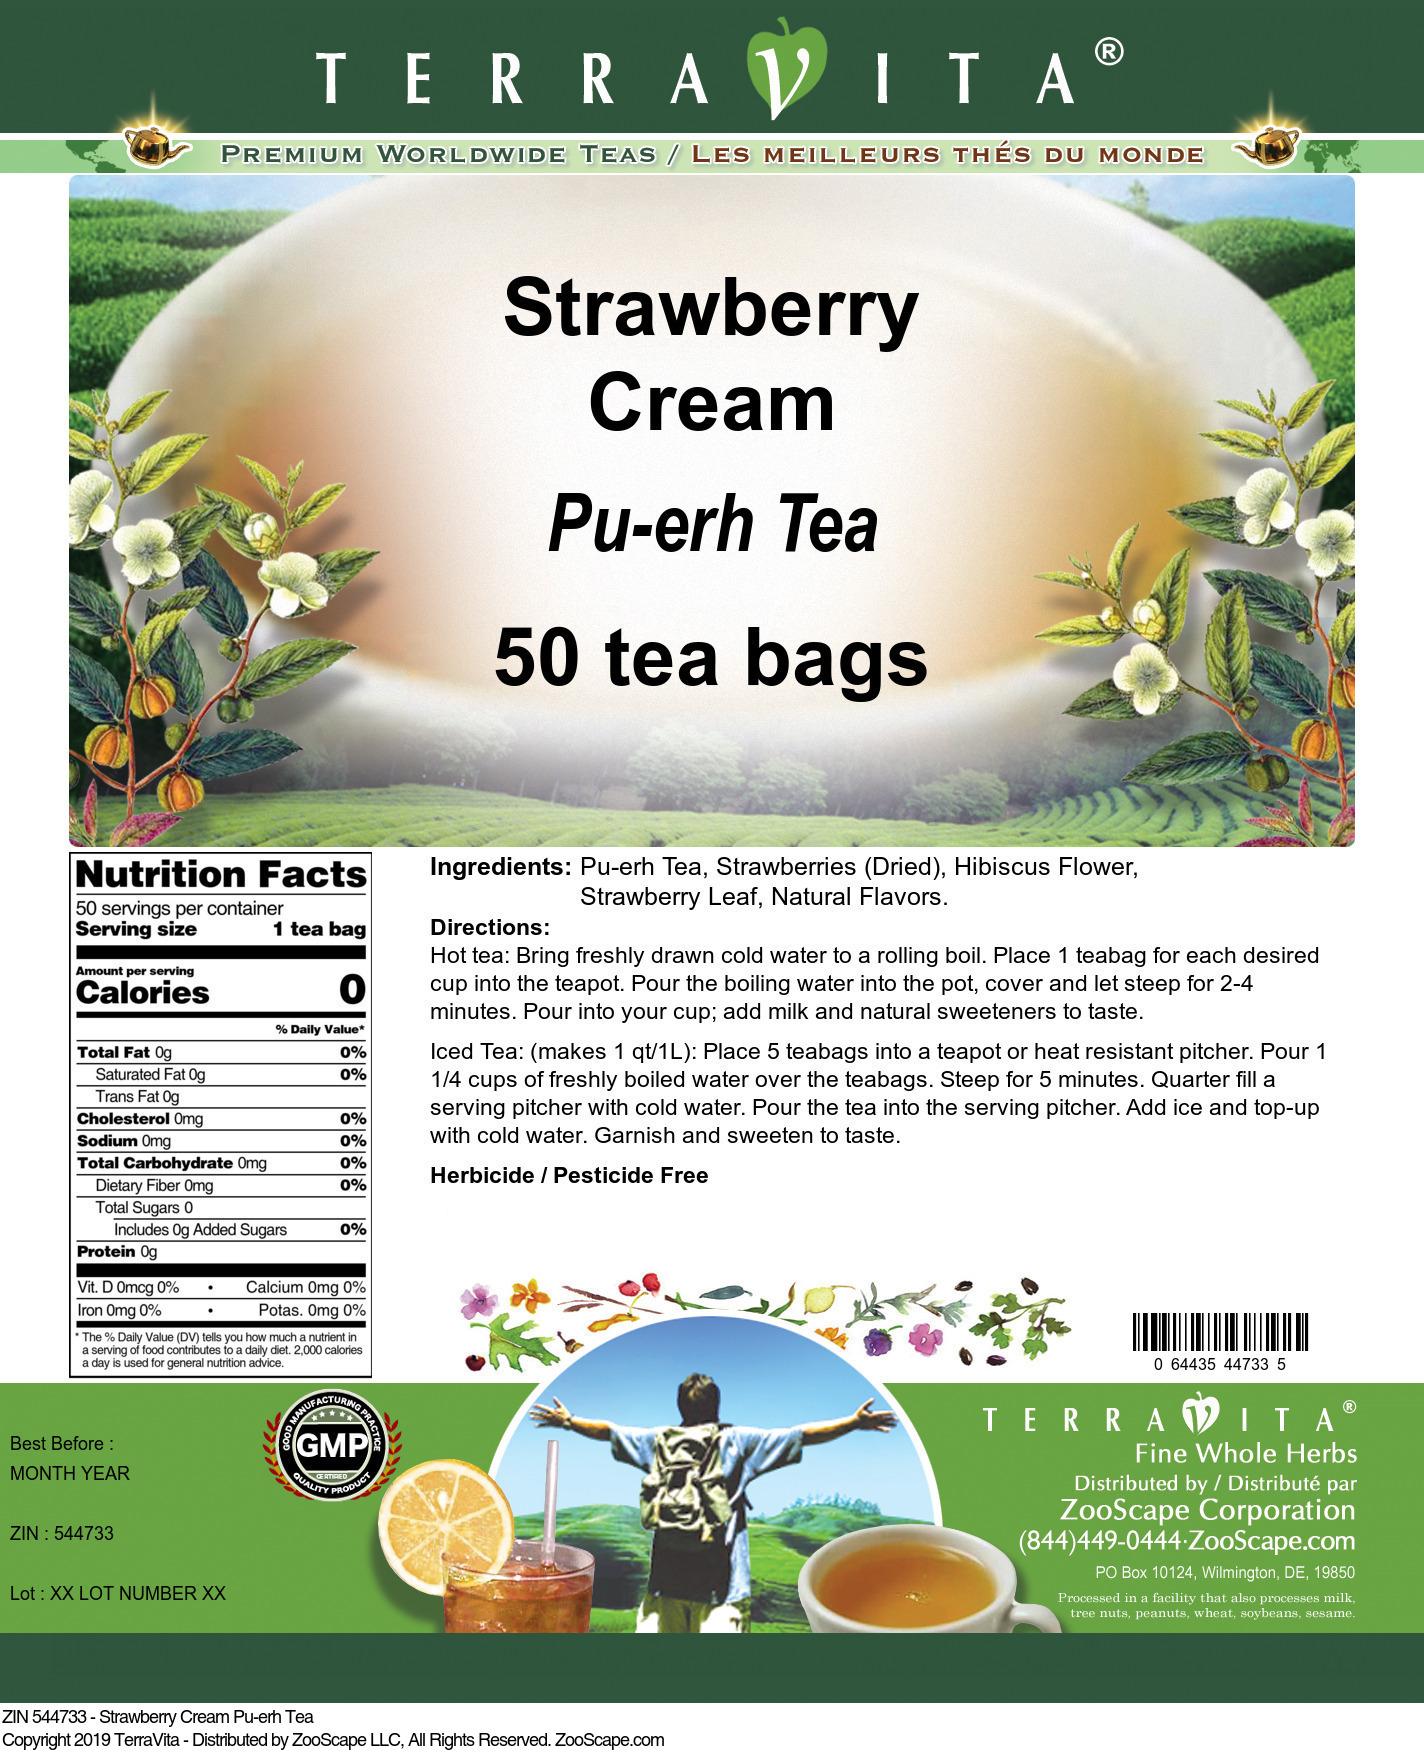 Strawberry Cream Pu-erh Tea